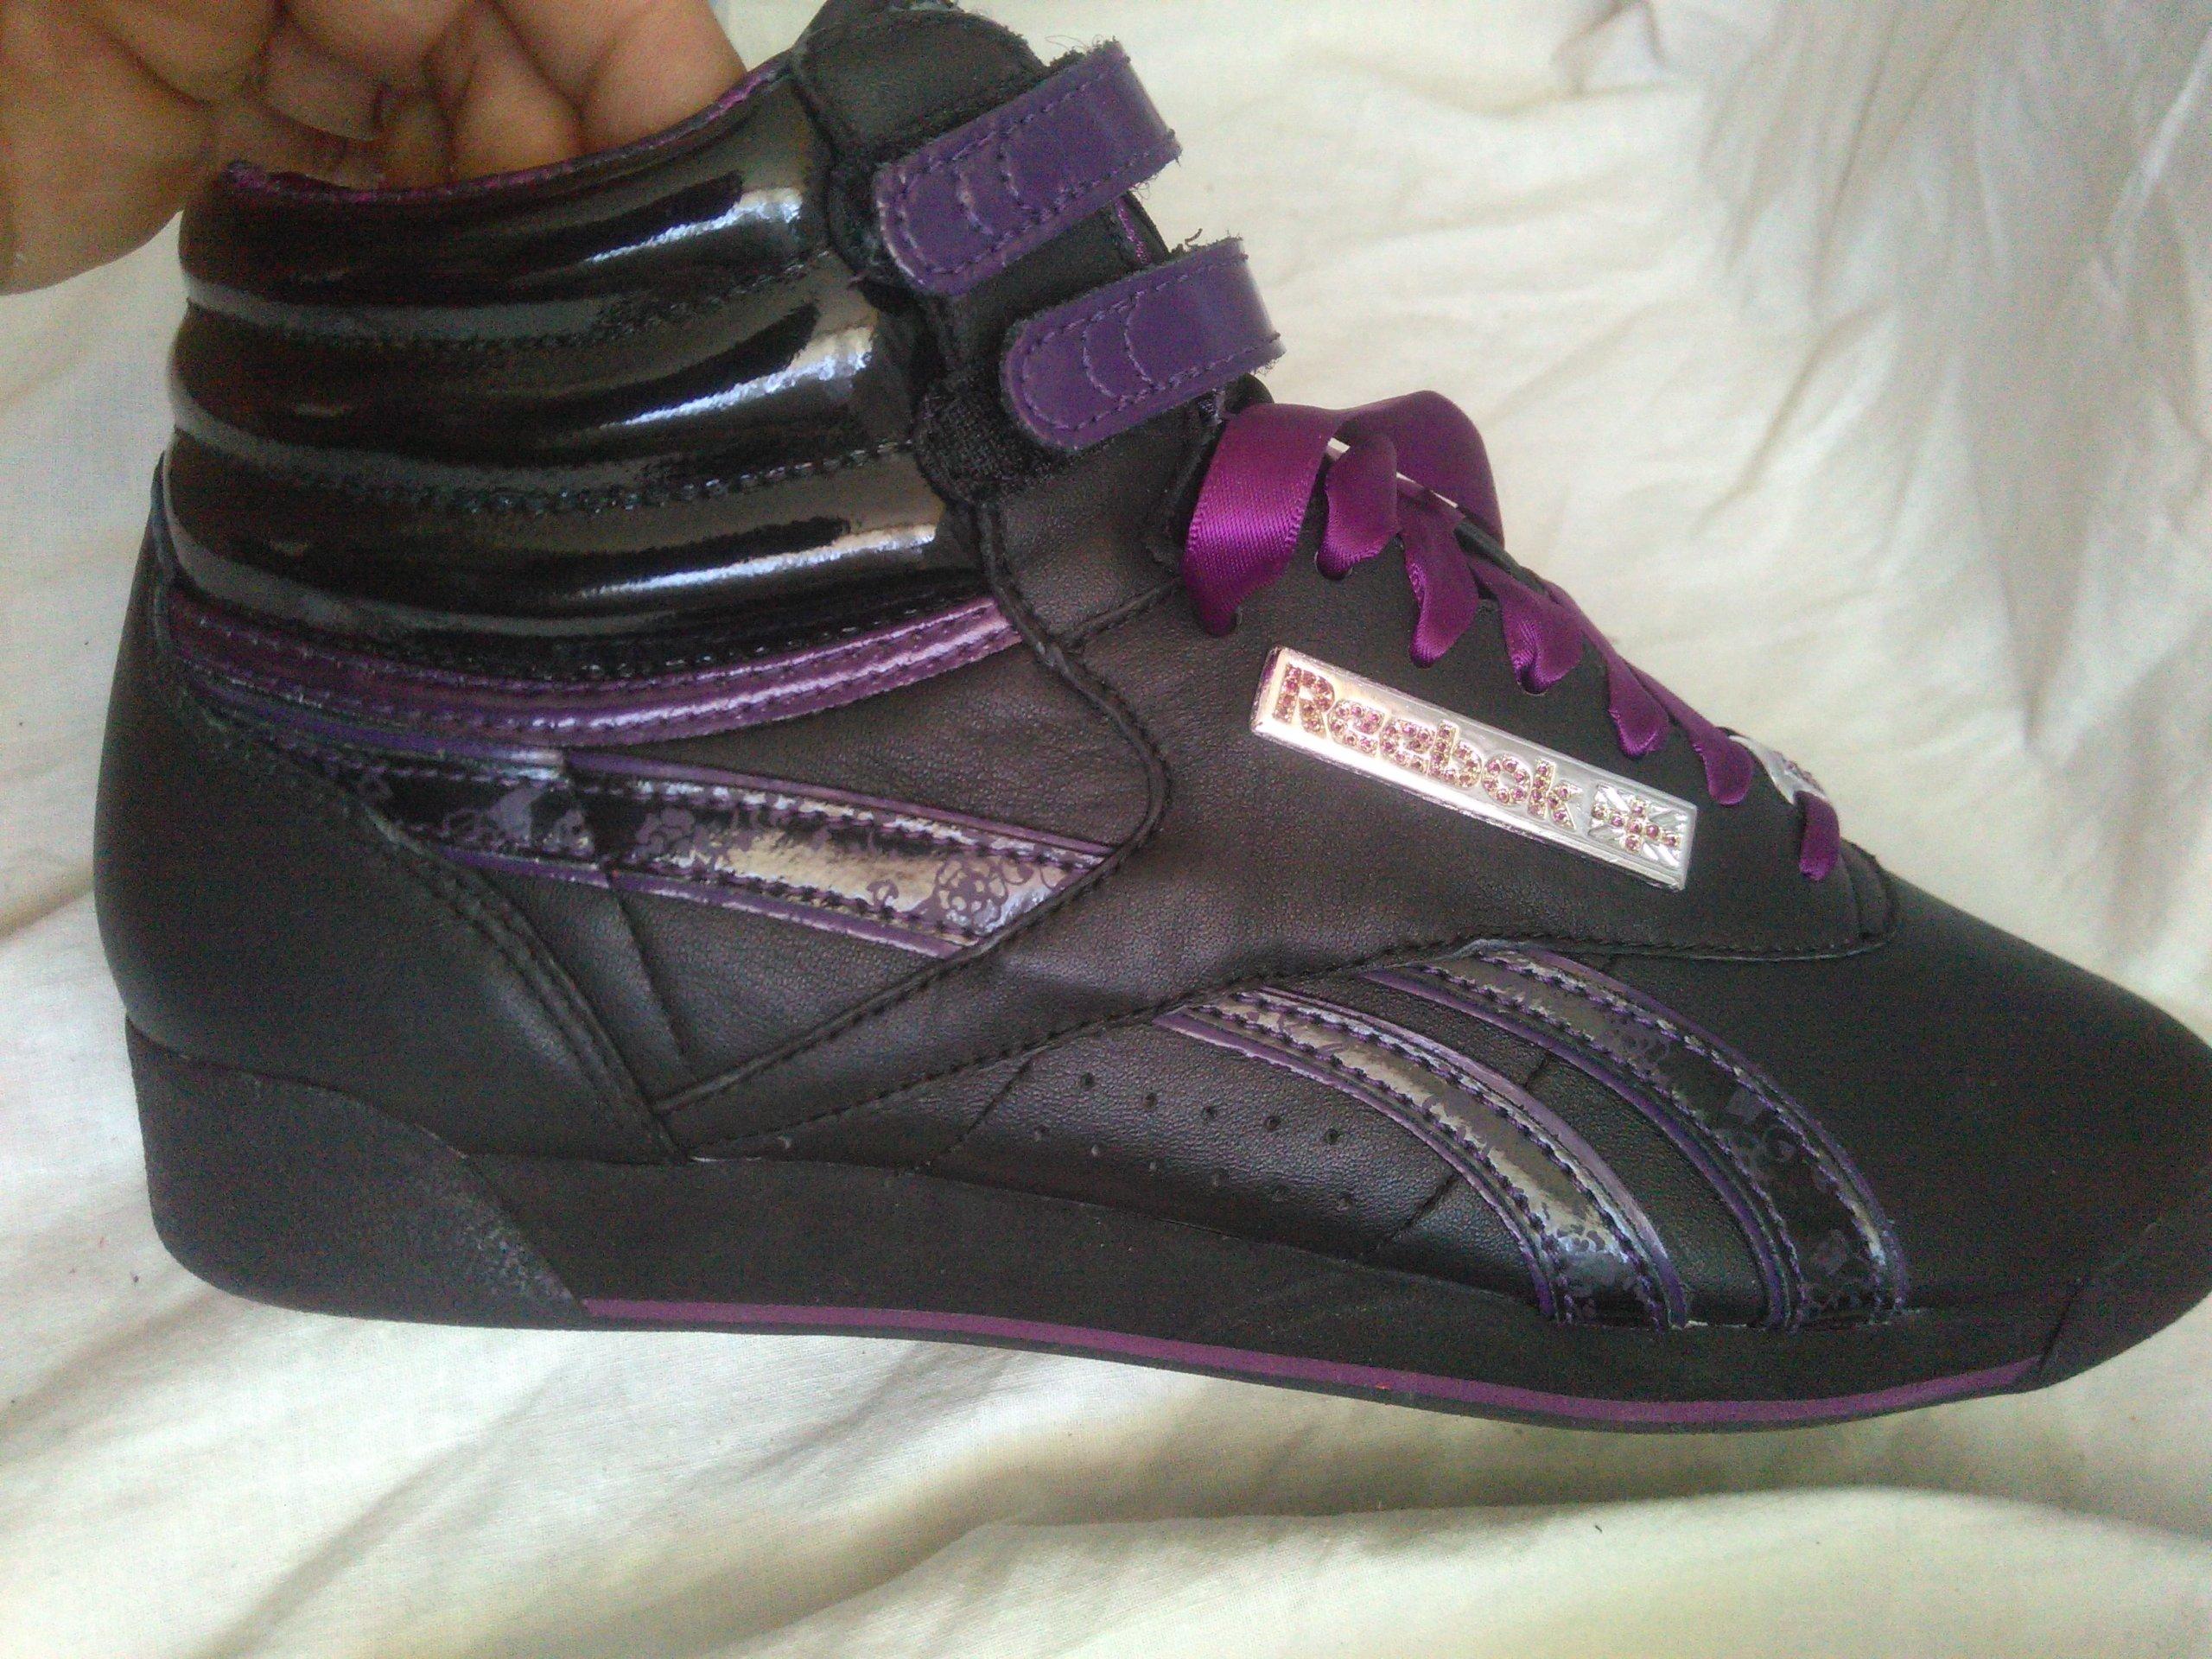 62623bd6 buty za kostke reebok classic high 38 24cm jesień - 7608224218 ...